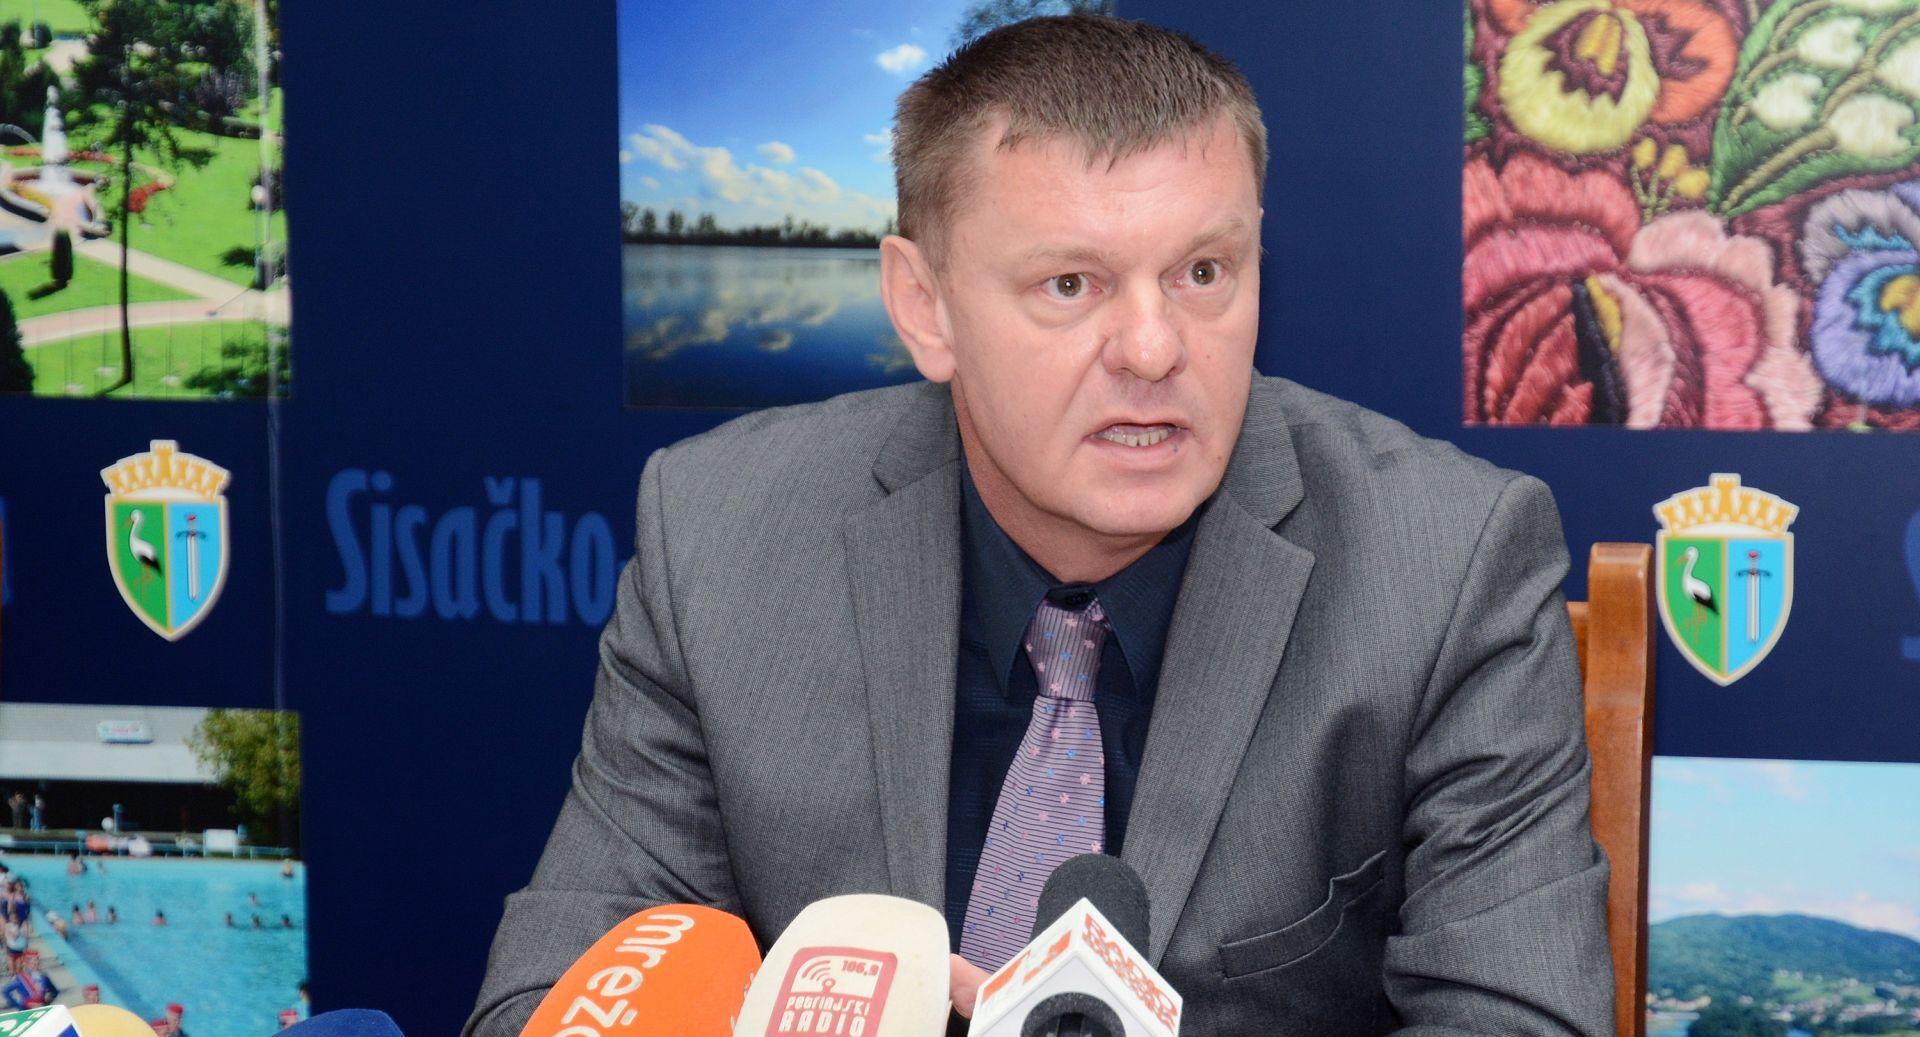 Petrinjsko vodstvo SDSS-a napustilo stranku: Rad se svodi na trgovinu s HDZ-om i SDP-om